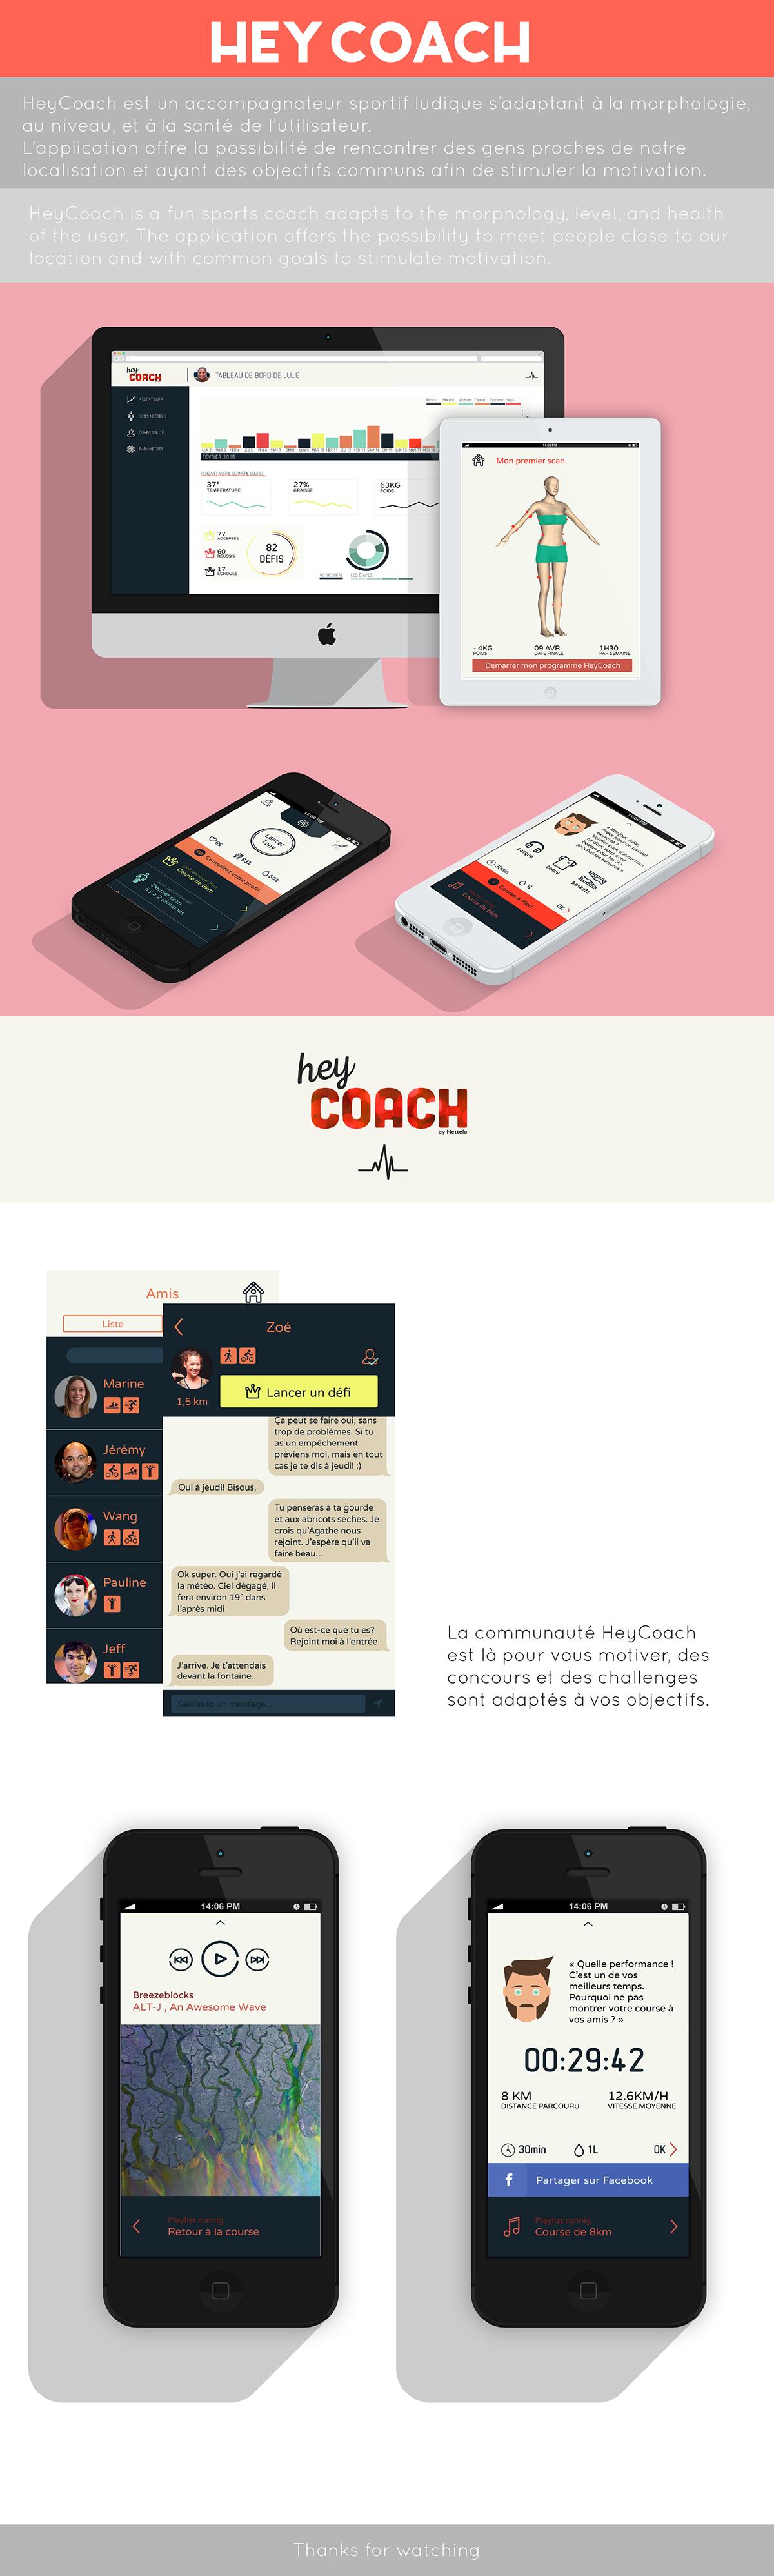 Coach sport nettelo Data scan 3D Health